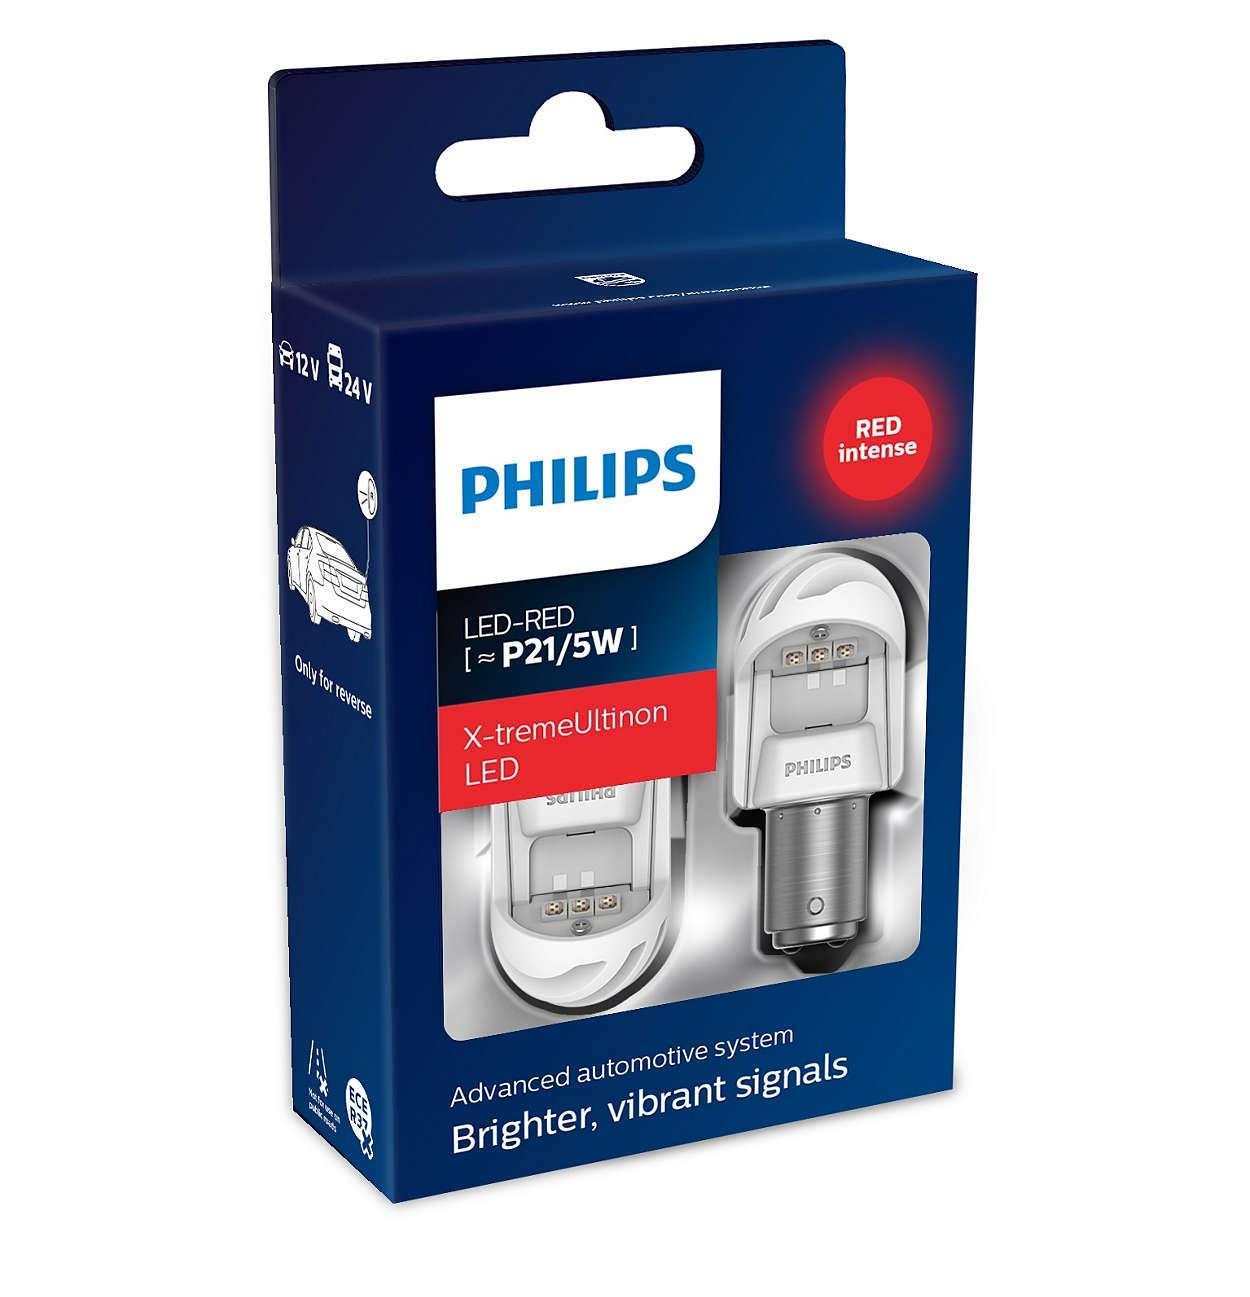 1 Pezzo 6000 Kelvin Philips automotive lighting 128596000KX1 X-tremeUltinon LED Luce per abitacolo C5W 38mm Festoon 6000K 12V